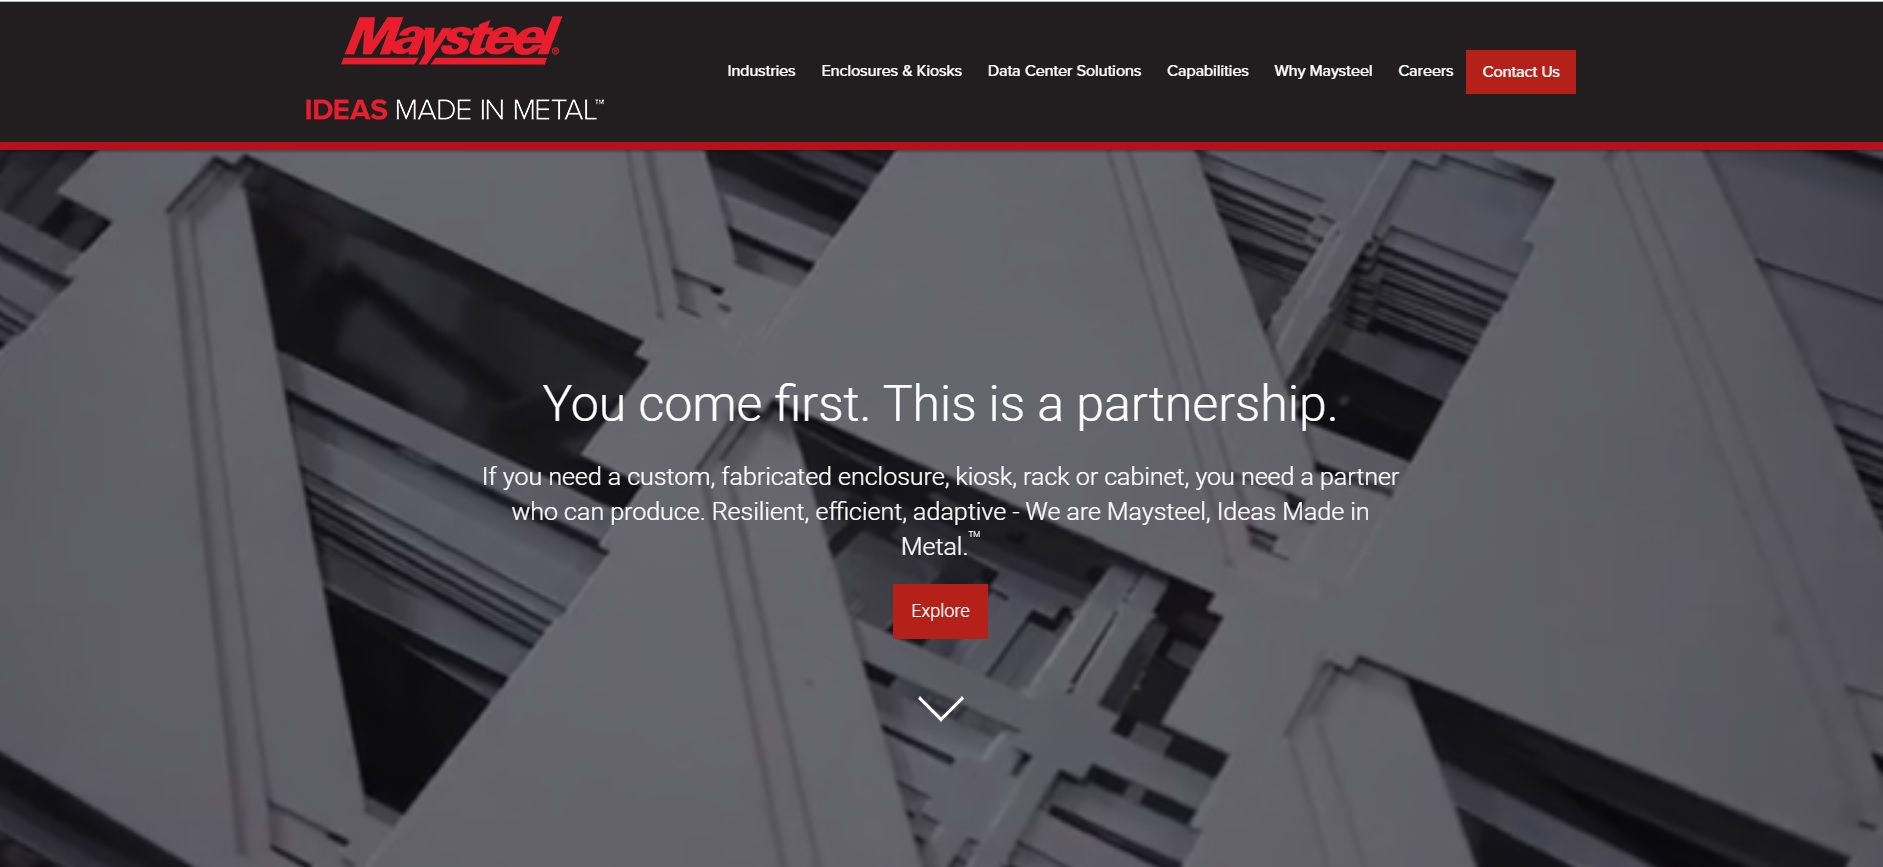 Maysteel Industries, LLC